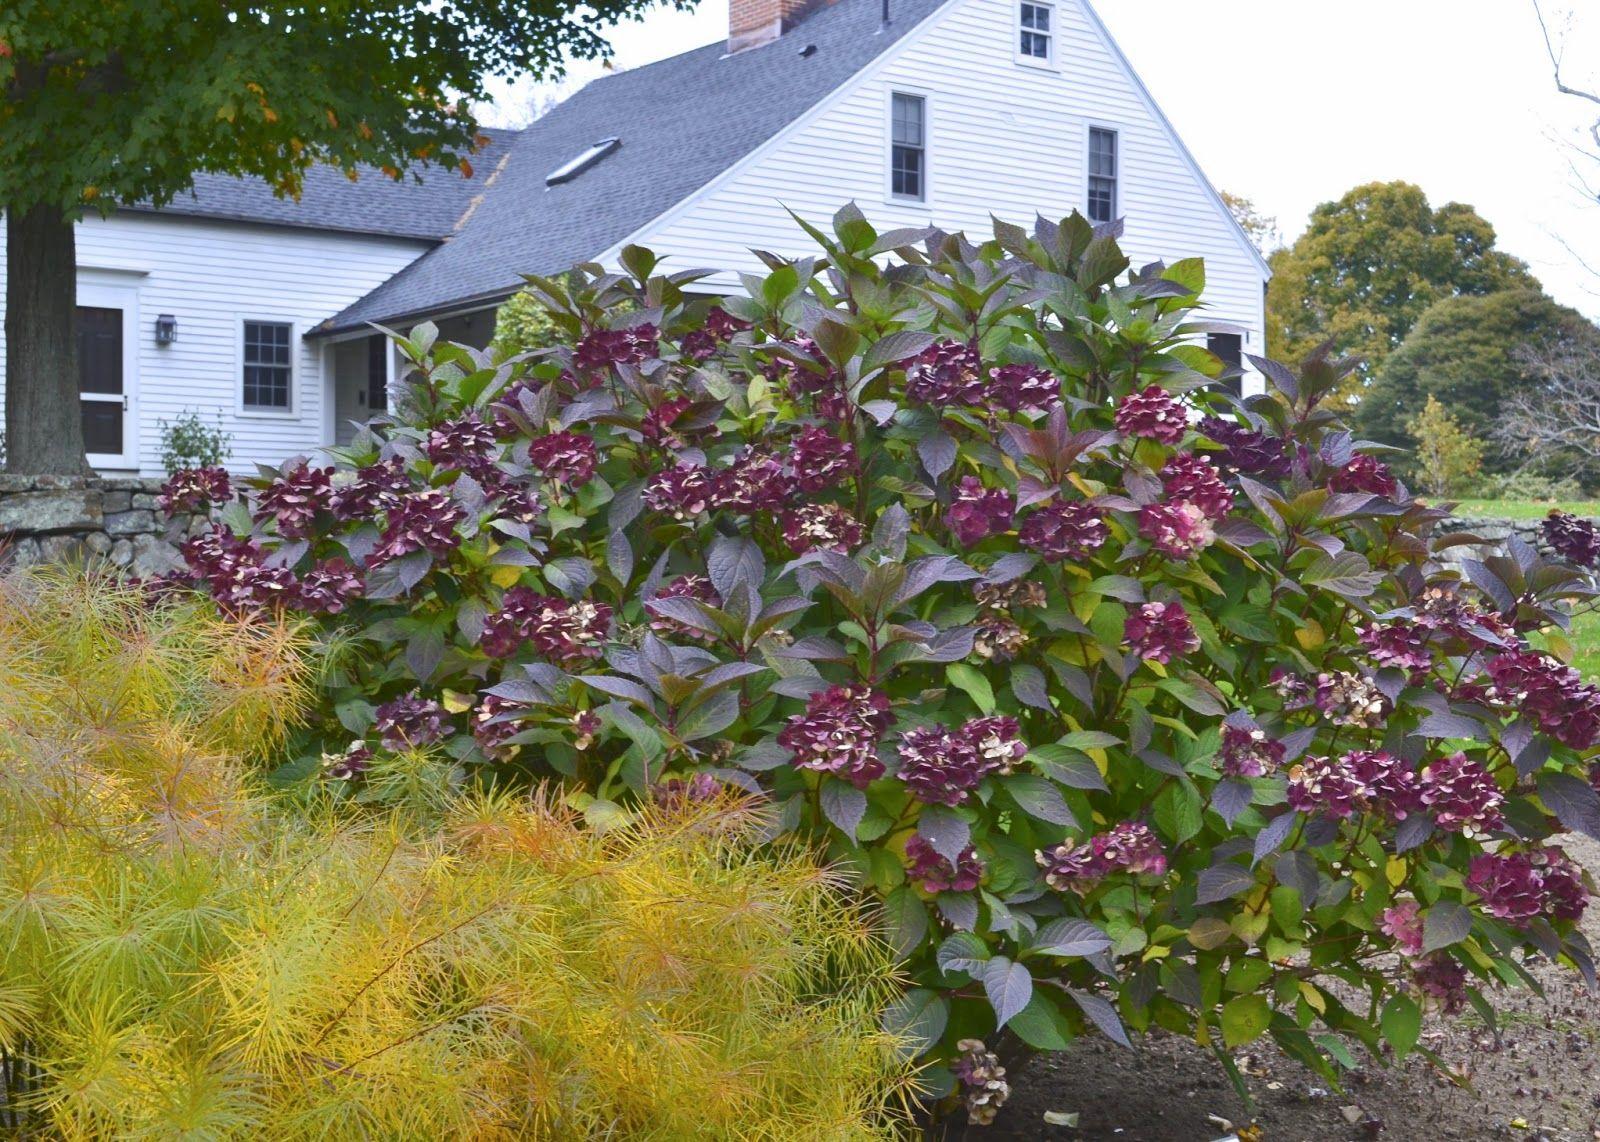 Hydrangea In Flower Threadleaf Amsonia Taking On Fall Color White